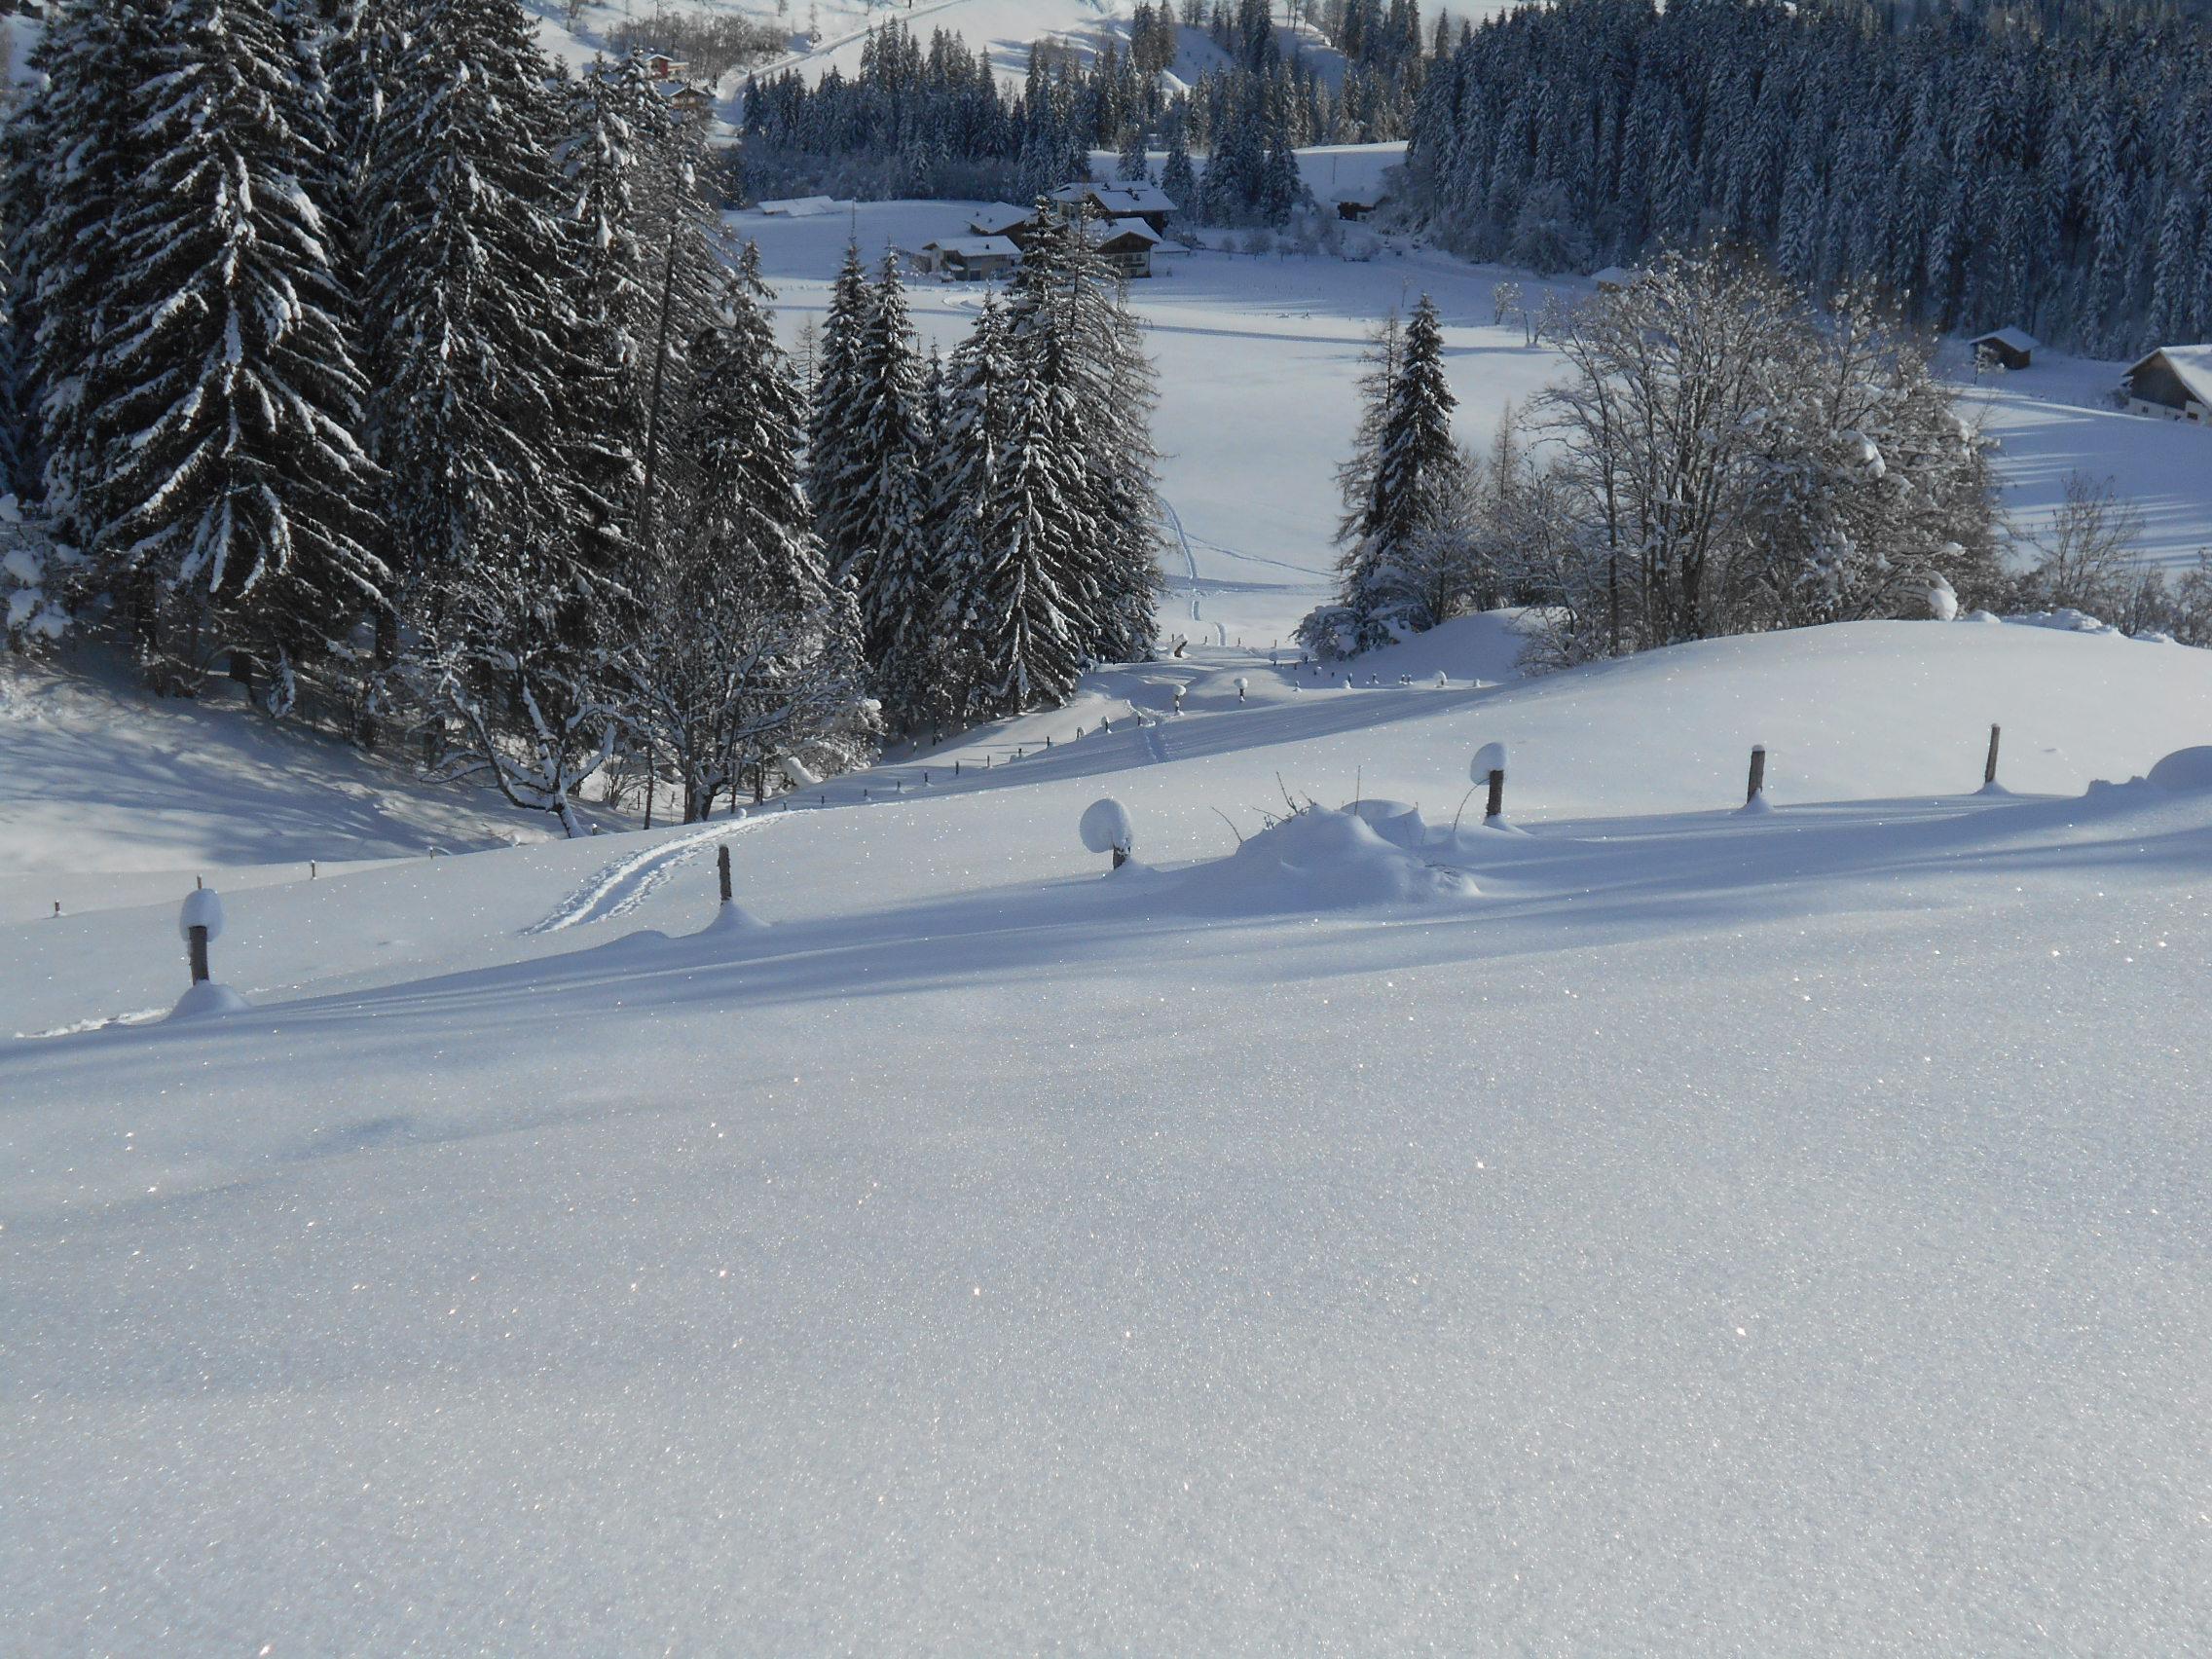 Schneeschuhwanderung 2016 01 19 10 laemmerhof 39 s blog for Fischteich im winter